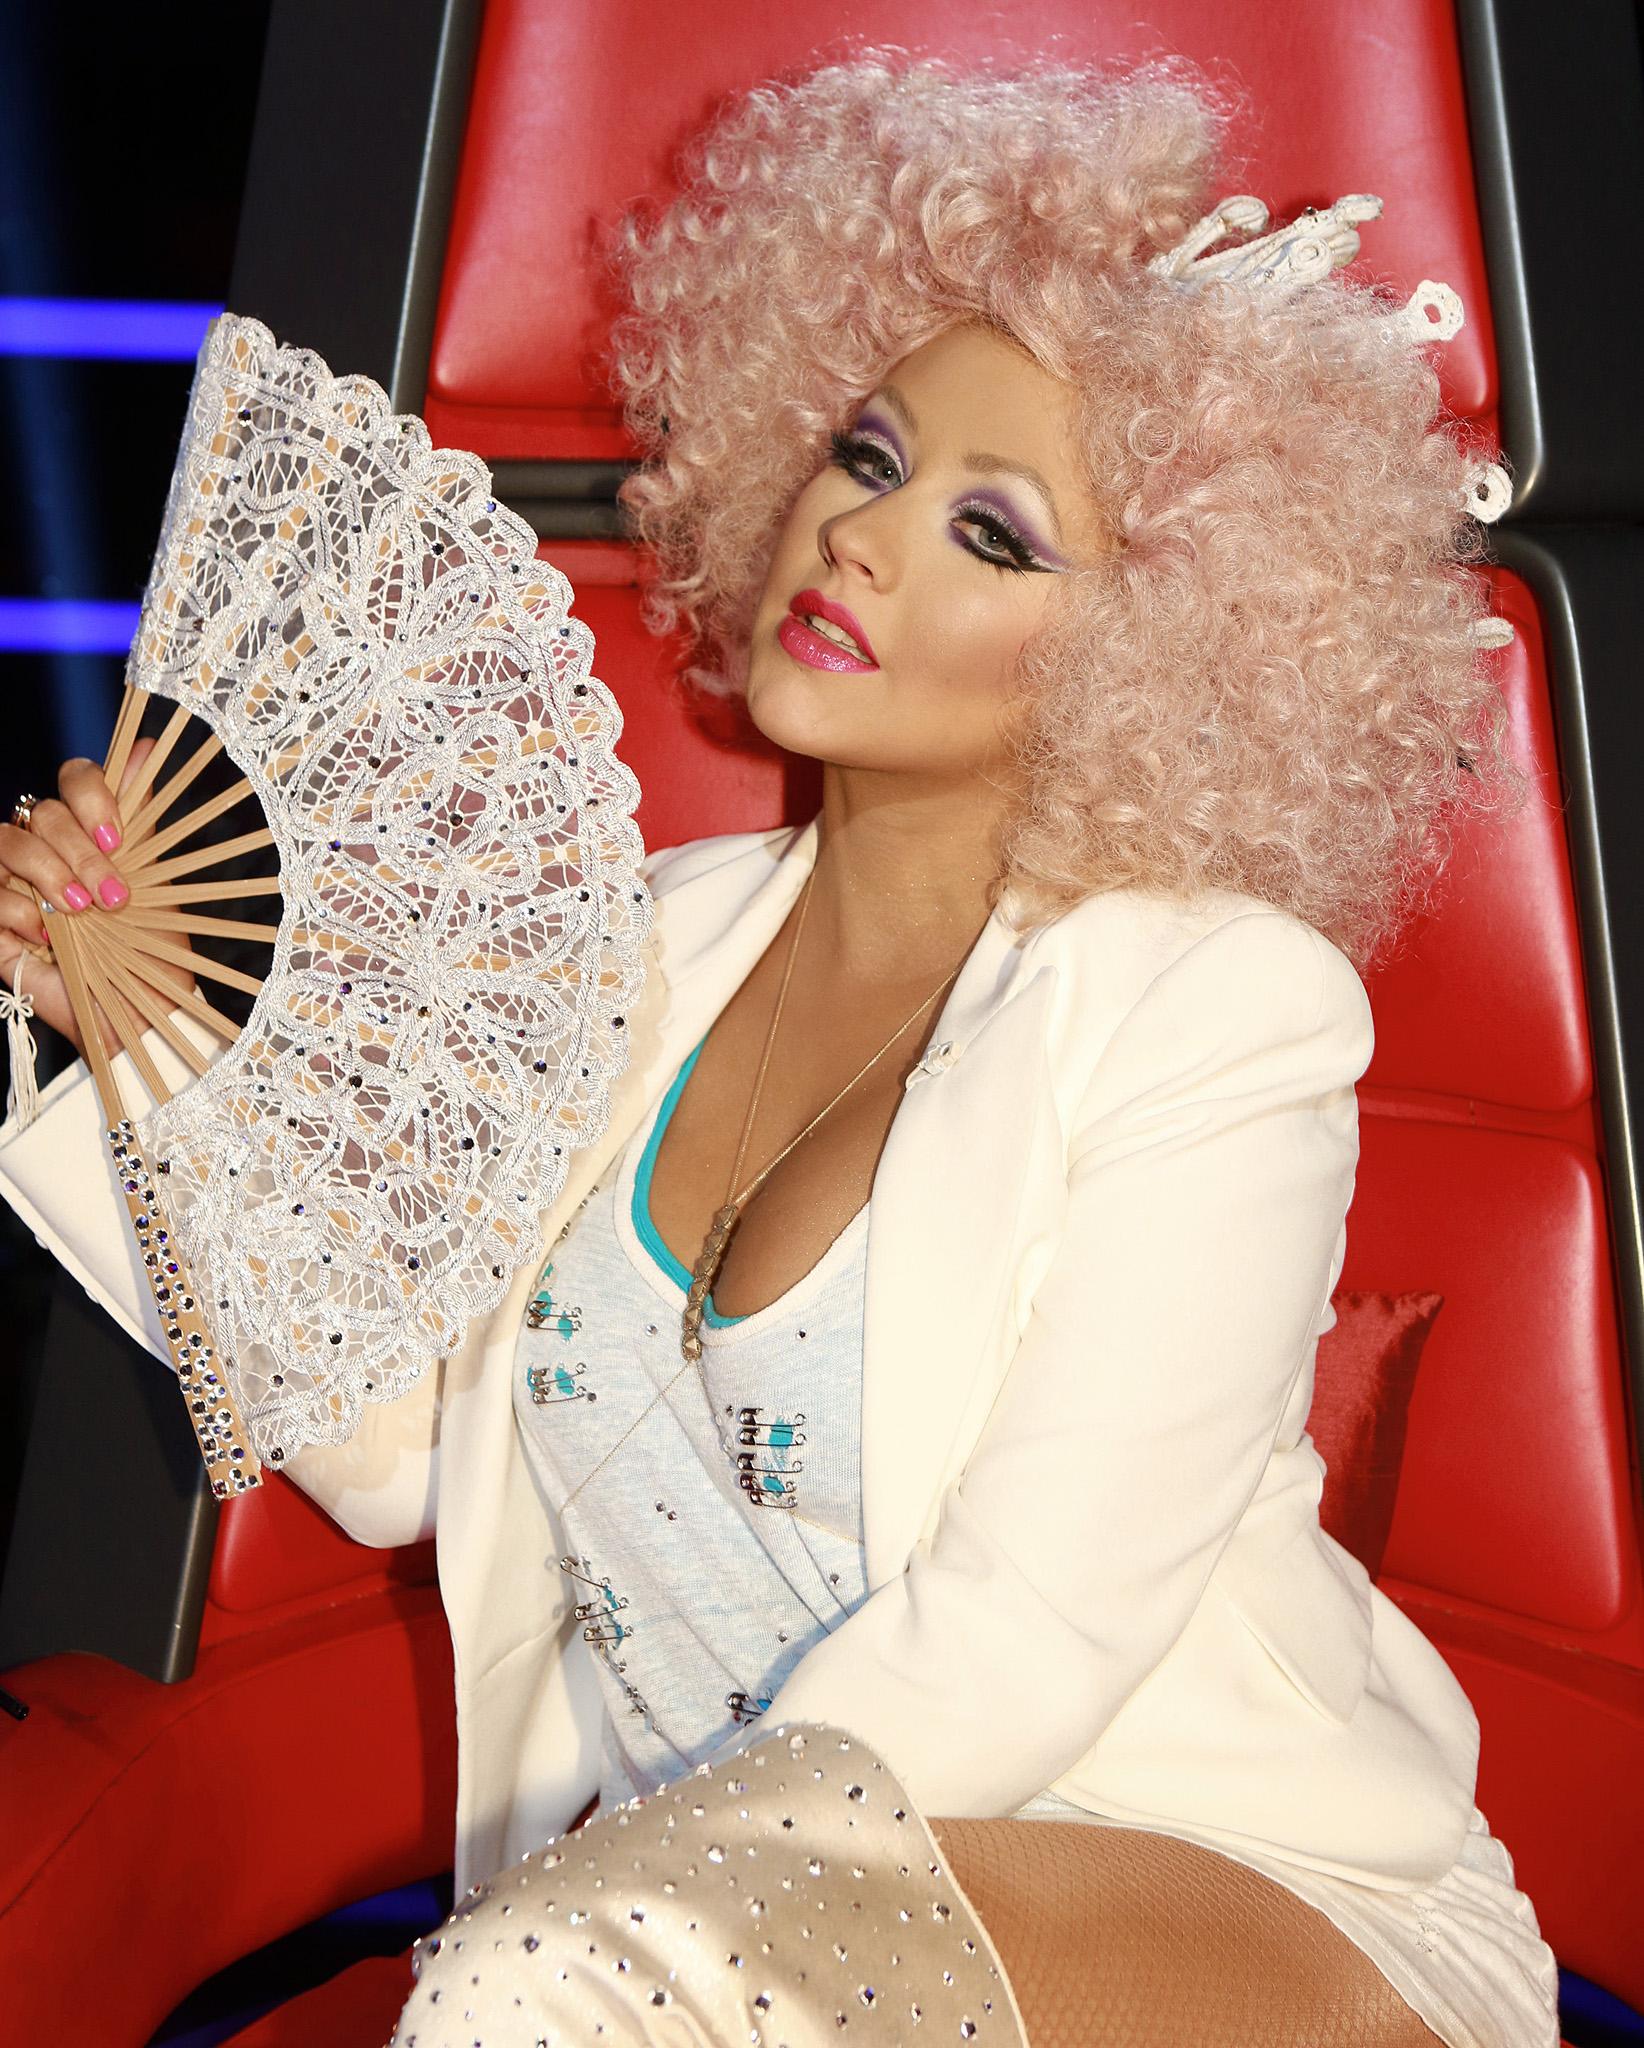 christina-aguilera-the-voice-fashion1.jpg